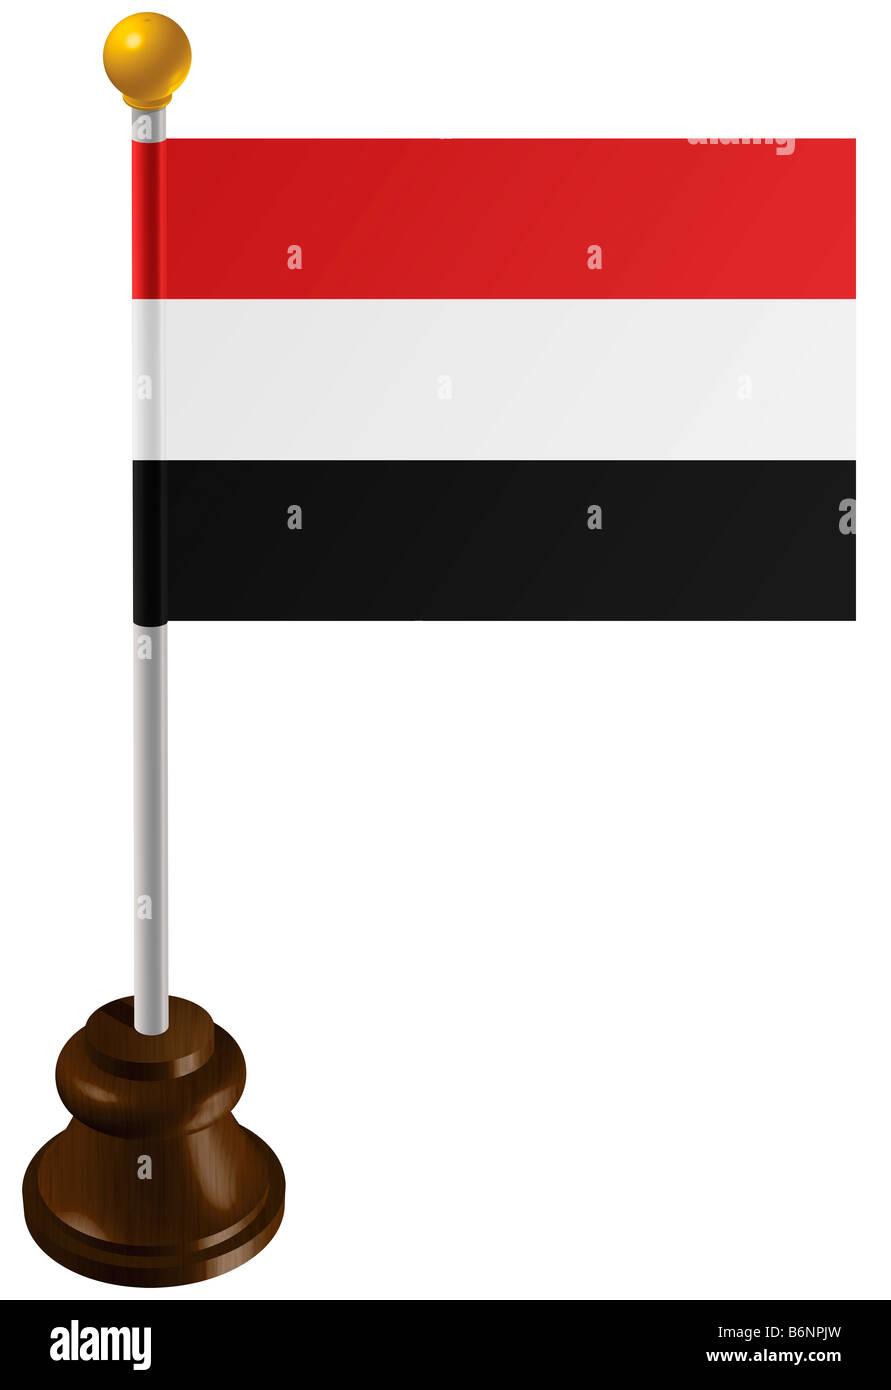 Yemen flag as a marker - Stock Image